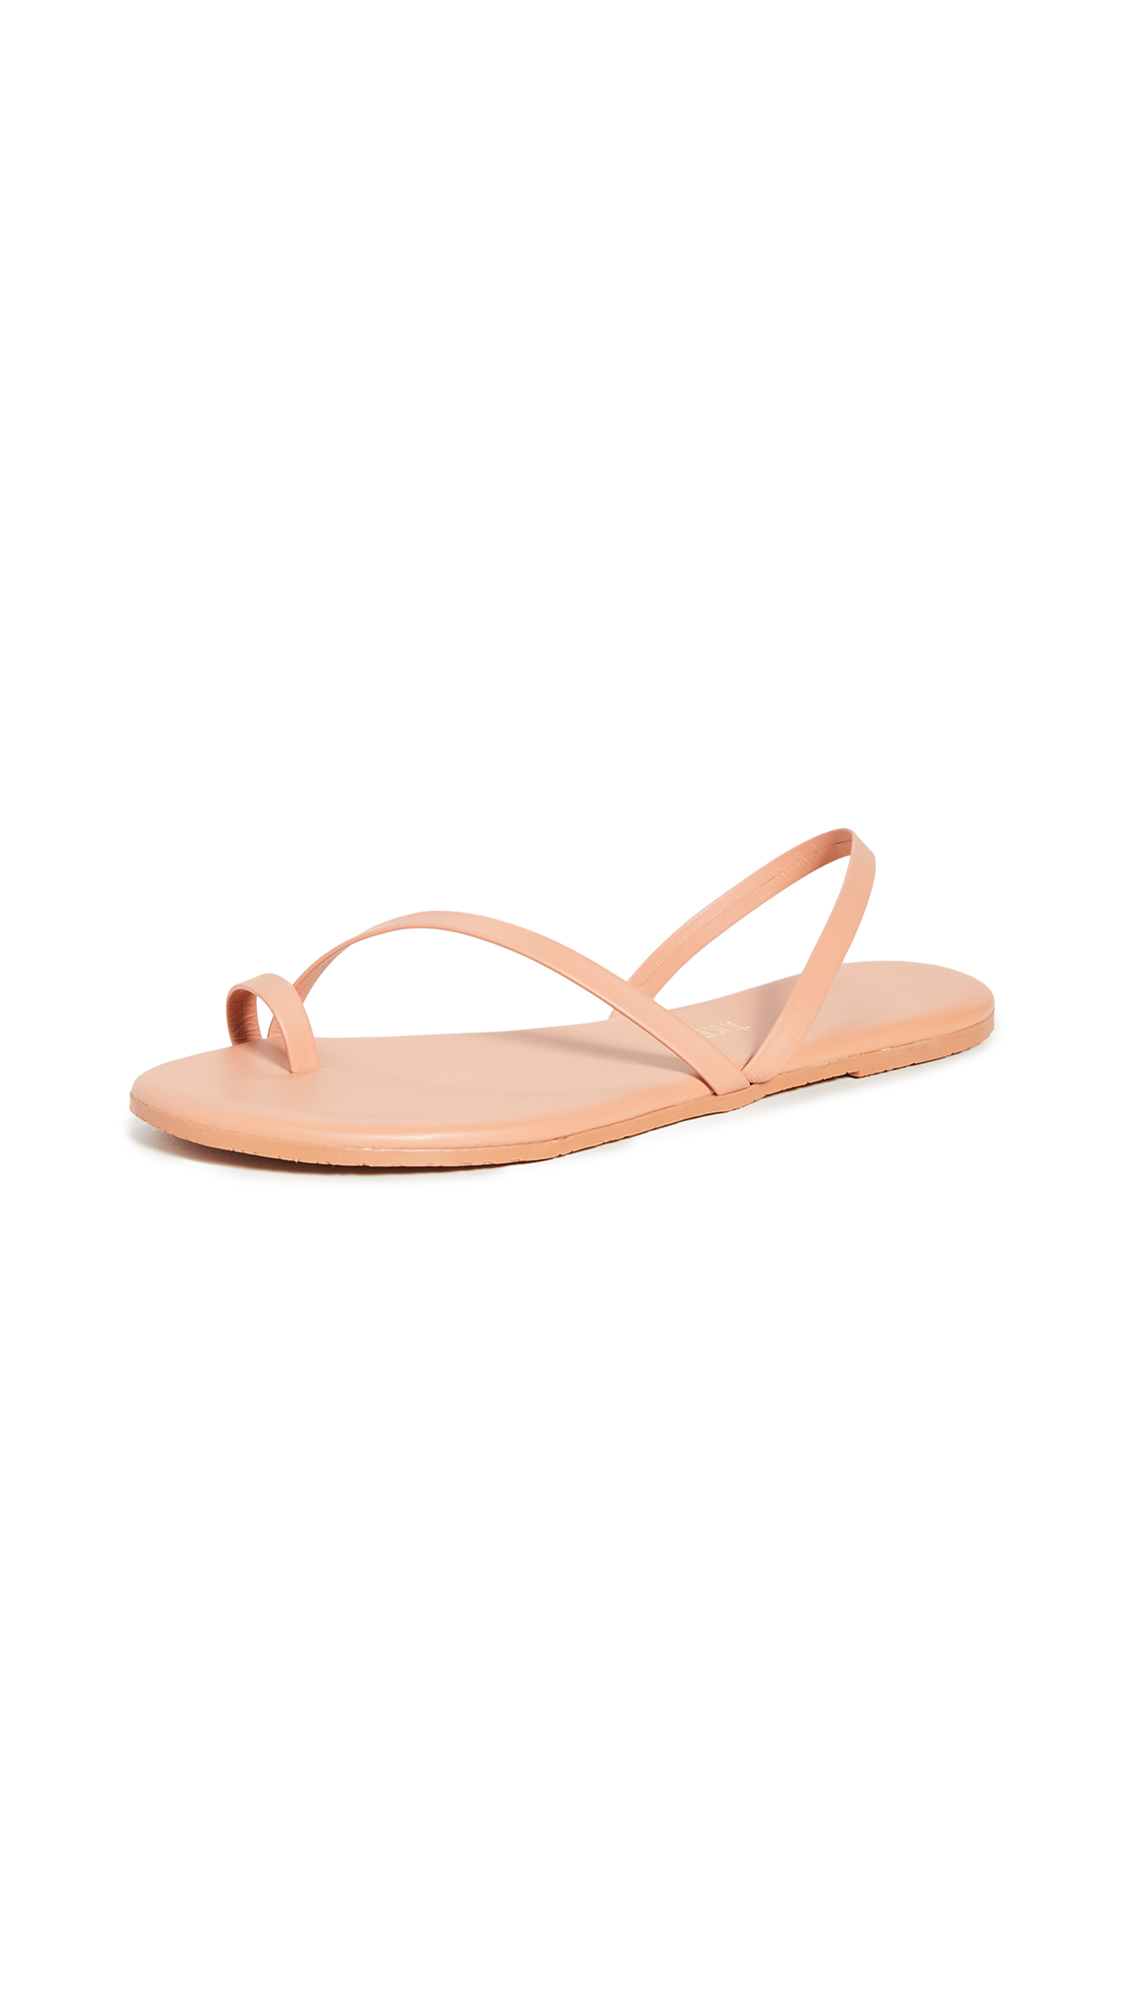 Buy TKEES LC Sandals online, shop TKEES